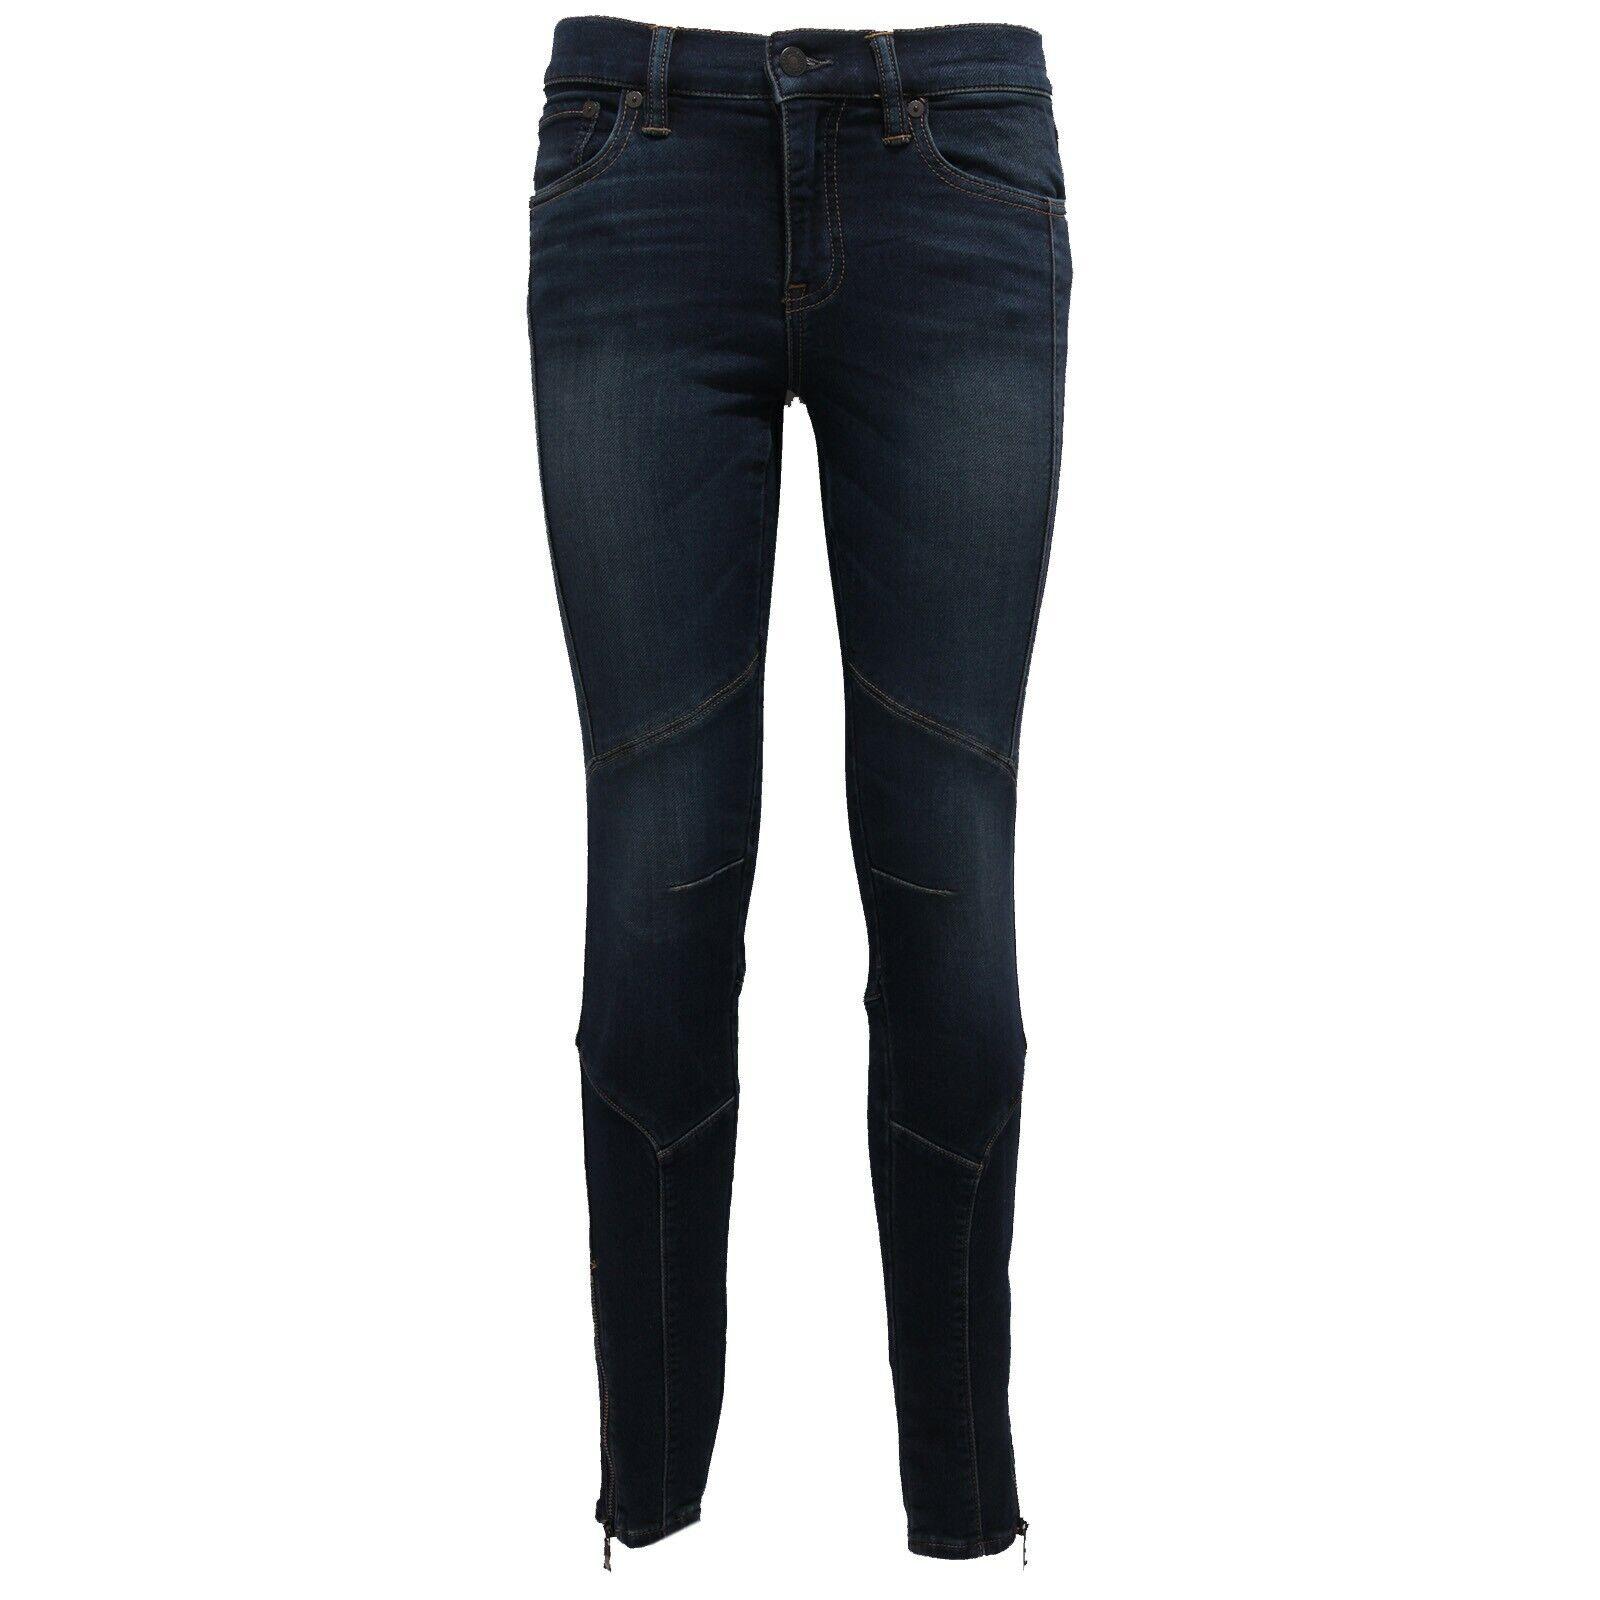 4280Z Jeans mujer RALPH LAUREN azul  delave & 039;JOGGJEANS Pantalón mujer  mejor vendido